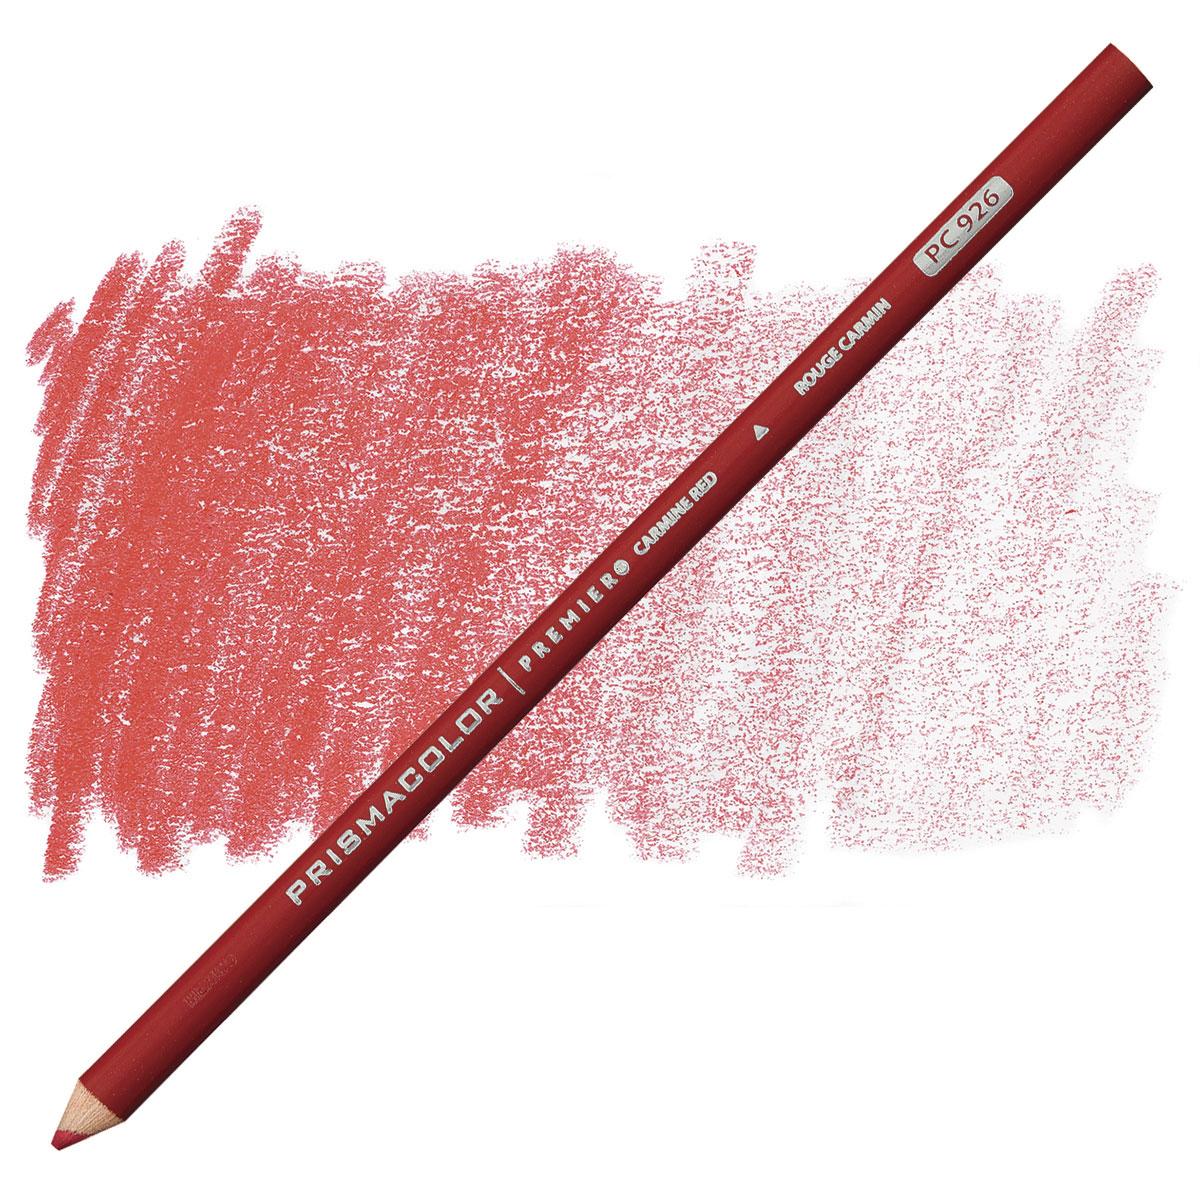 Carmine Red 926